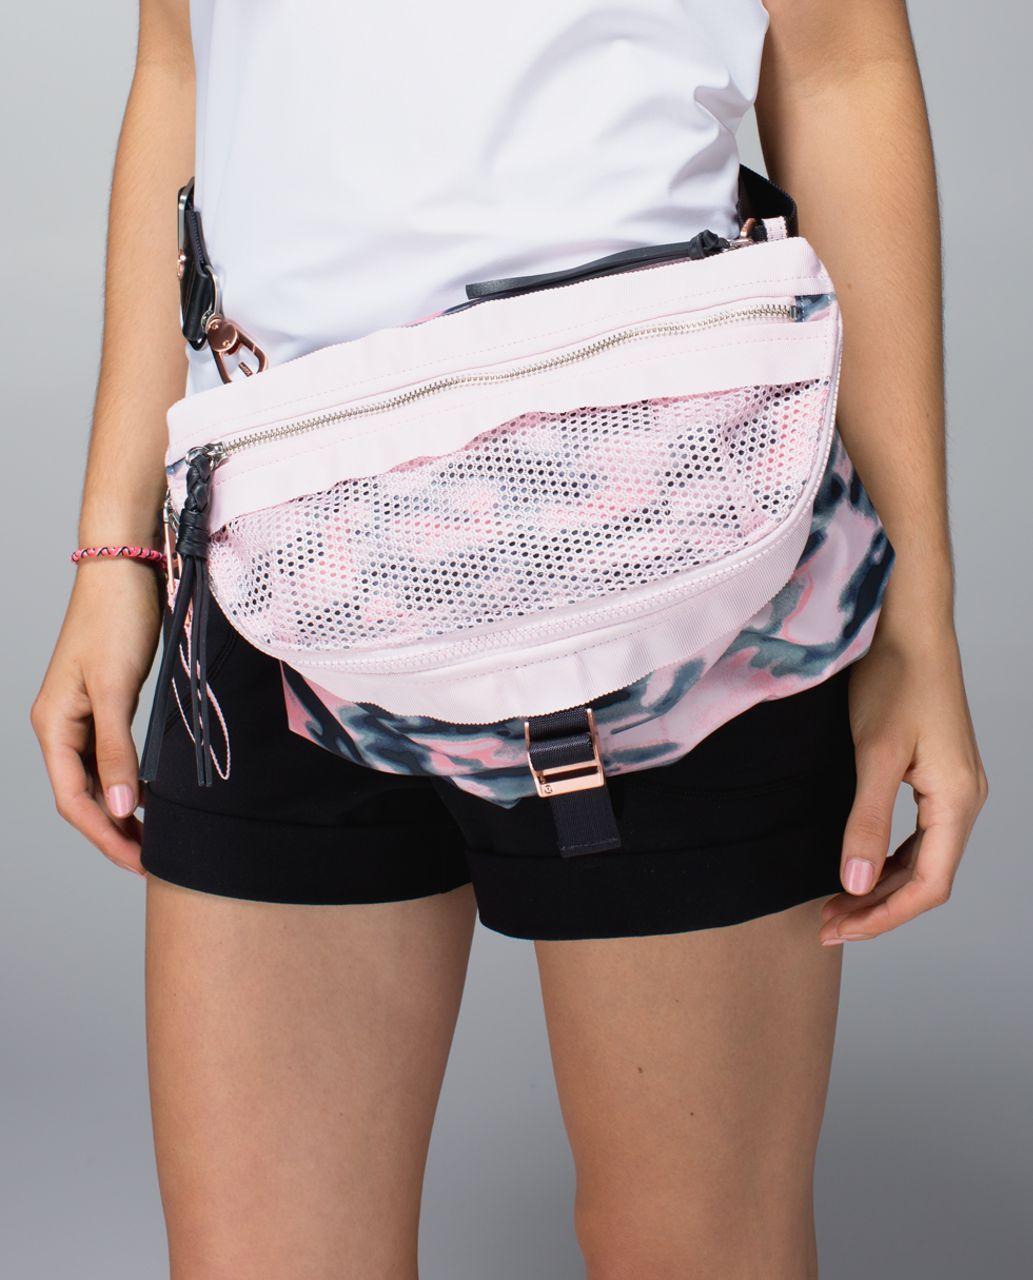 Lululemon Go Lightly Bag - Wamo Camo Barely Pink / Deep Coal